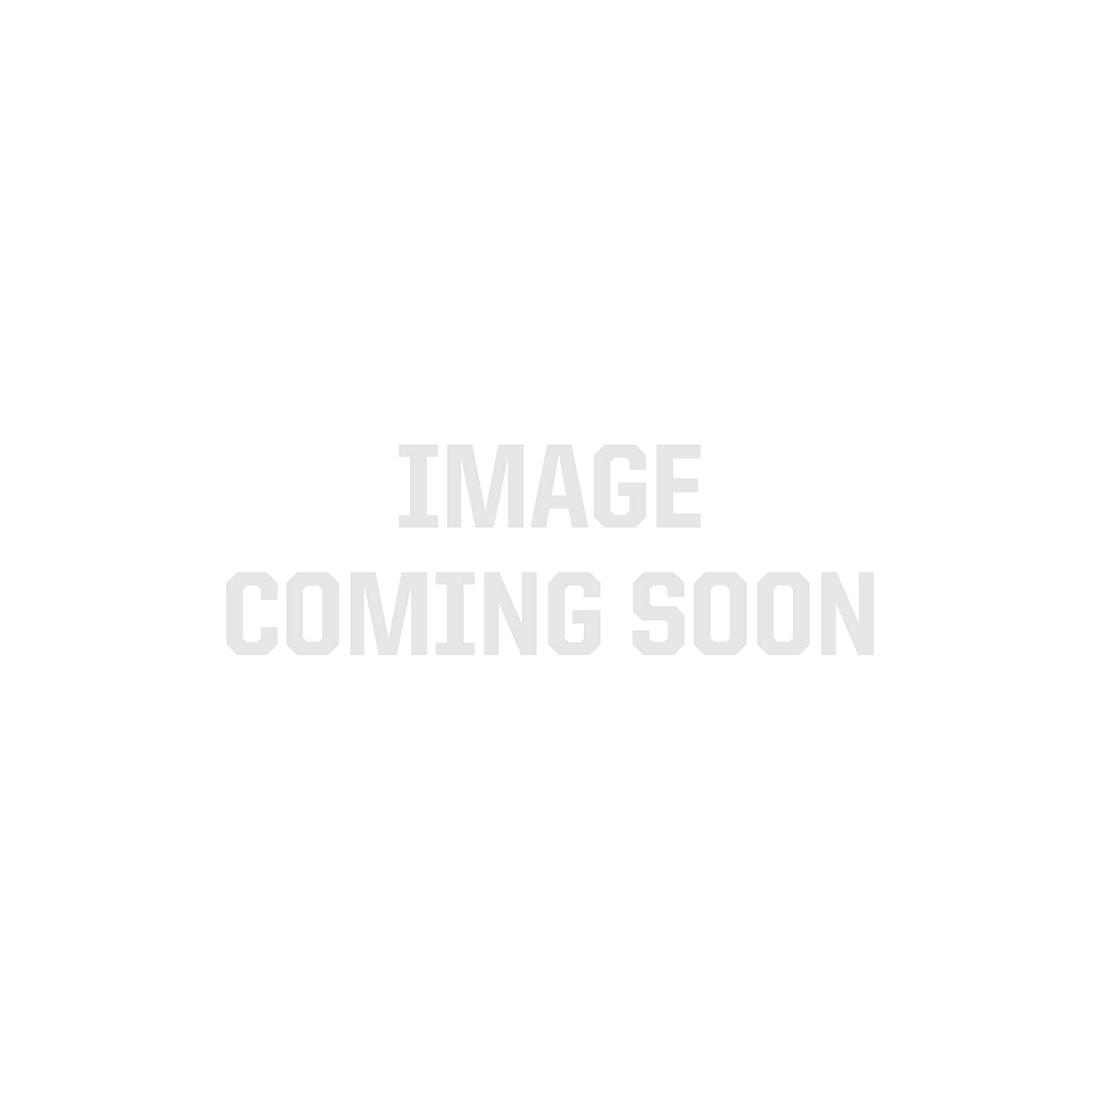 Daylight White 2835 CurrentControl Bendable ZigZag LED Strip Light, 60/m, 8mm wide, Sample Kit